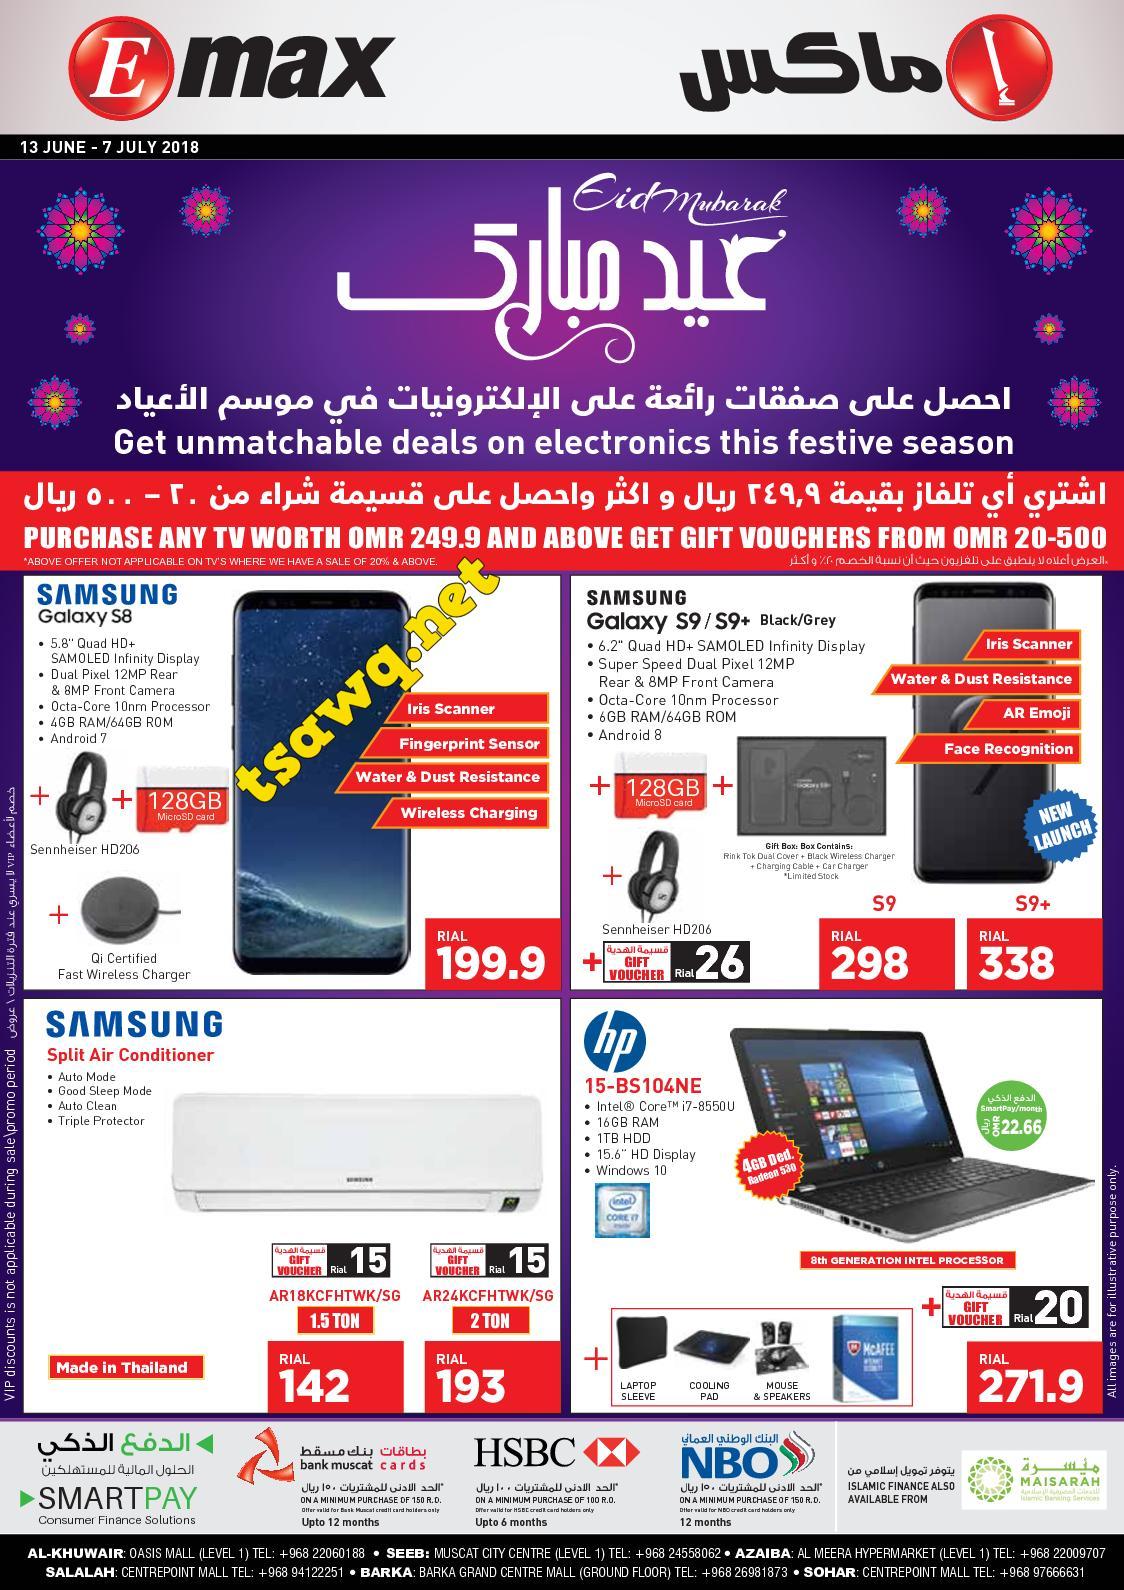 Calamo Tsawq Net Emax Oman 12 6 2018 Samsung Galaxy Grand Prime Quad Core Ghz Processor 8 Mp Camera Android Kitkat Ready